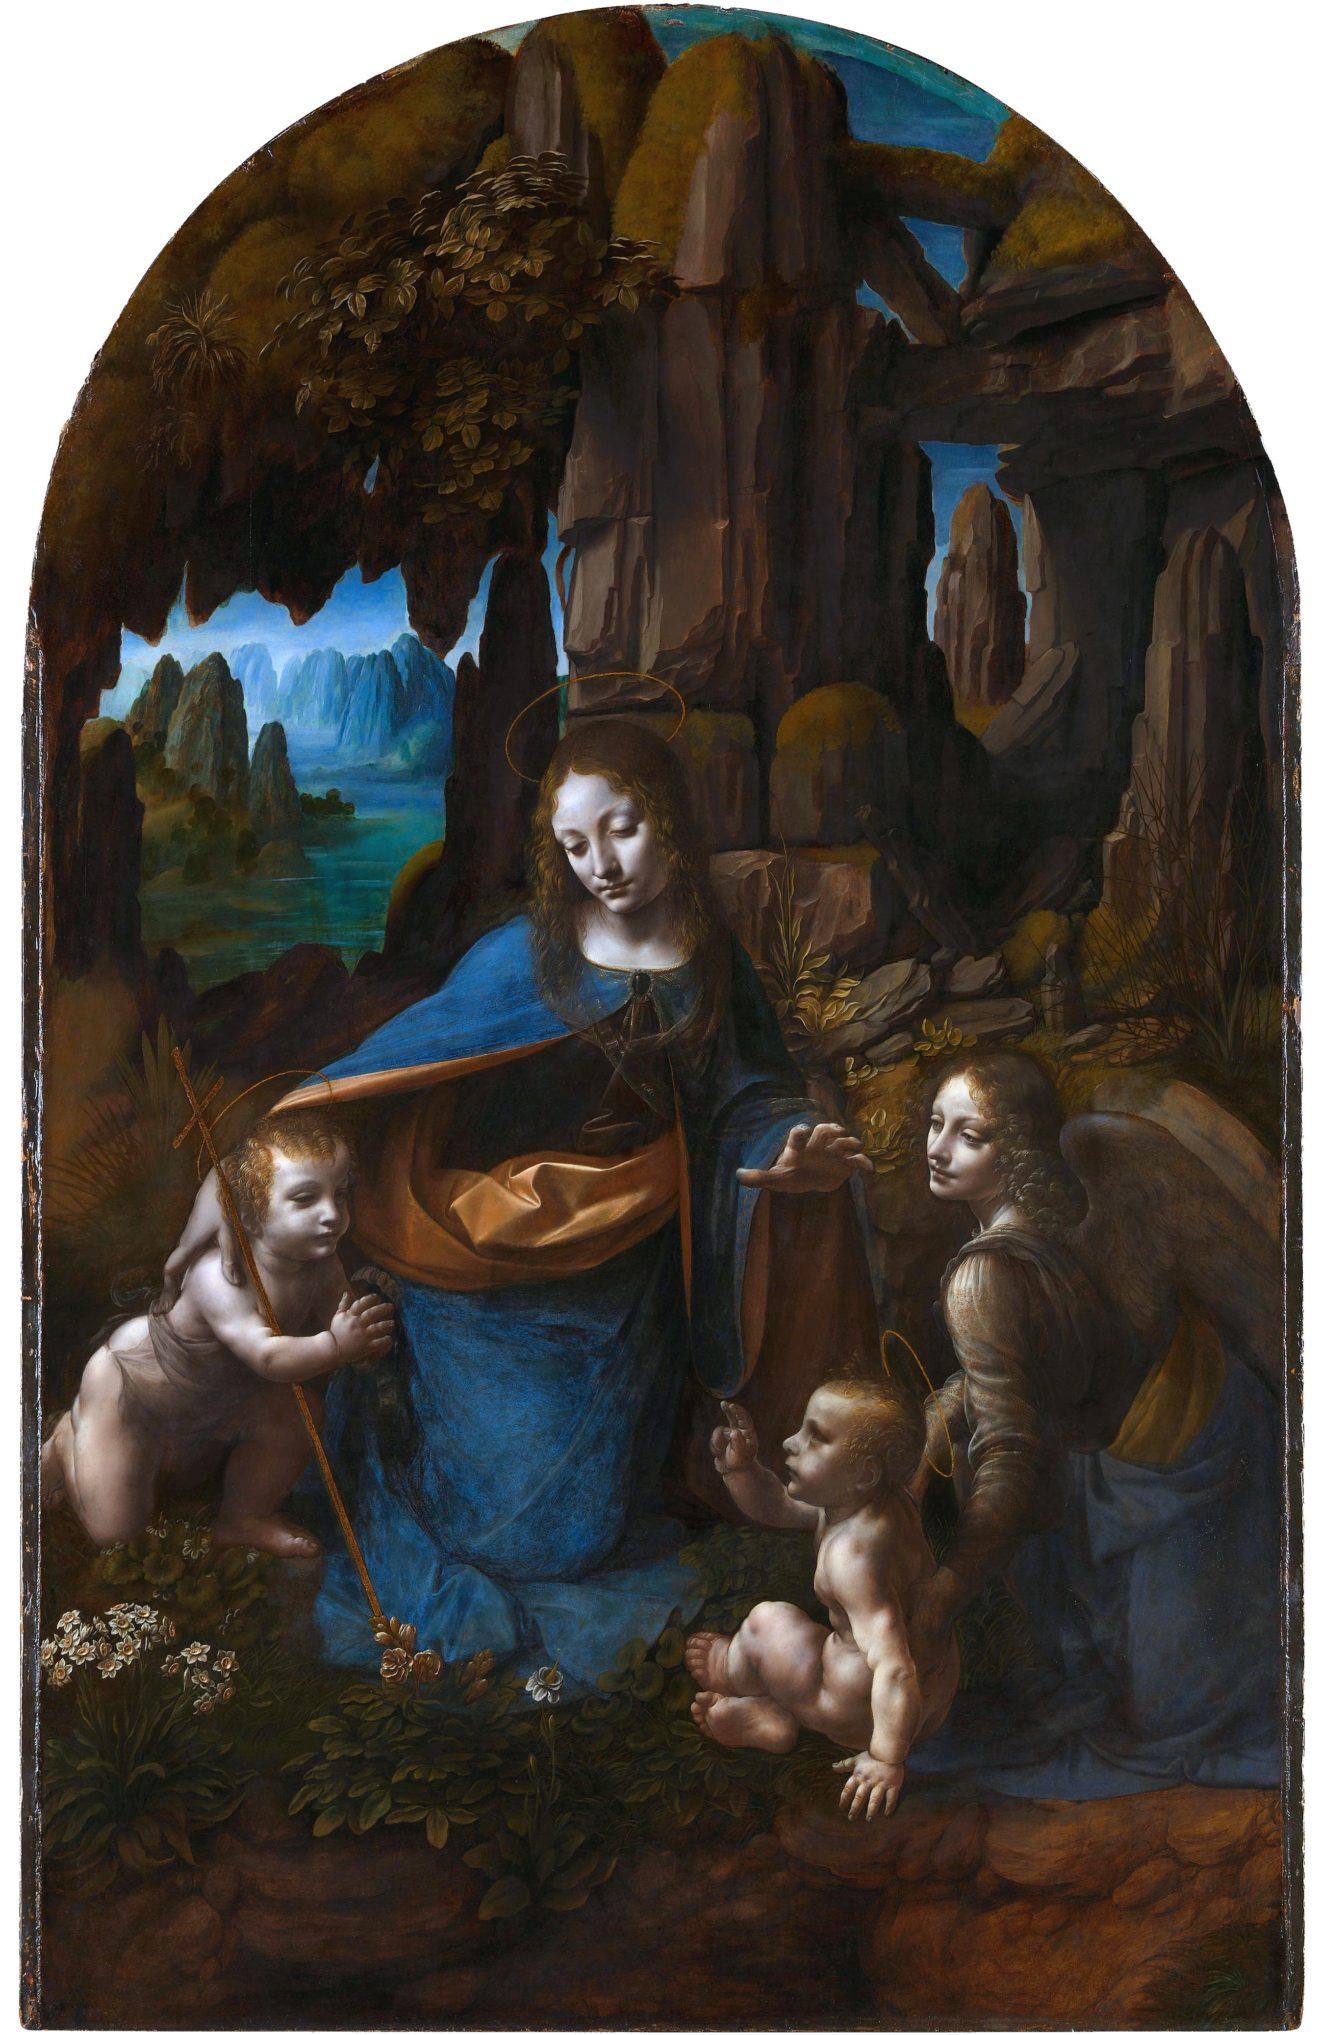 Леонардо да Винчи «Мадонна в скалах». 1508. Национальная галерея. Лондон